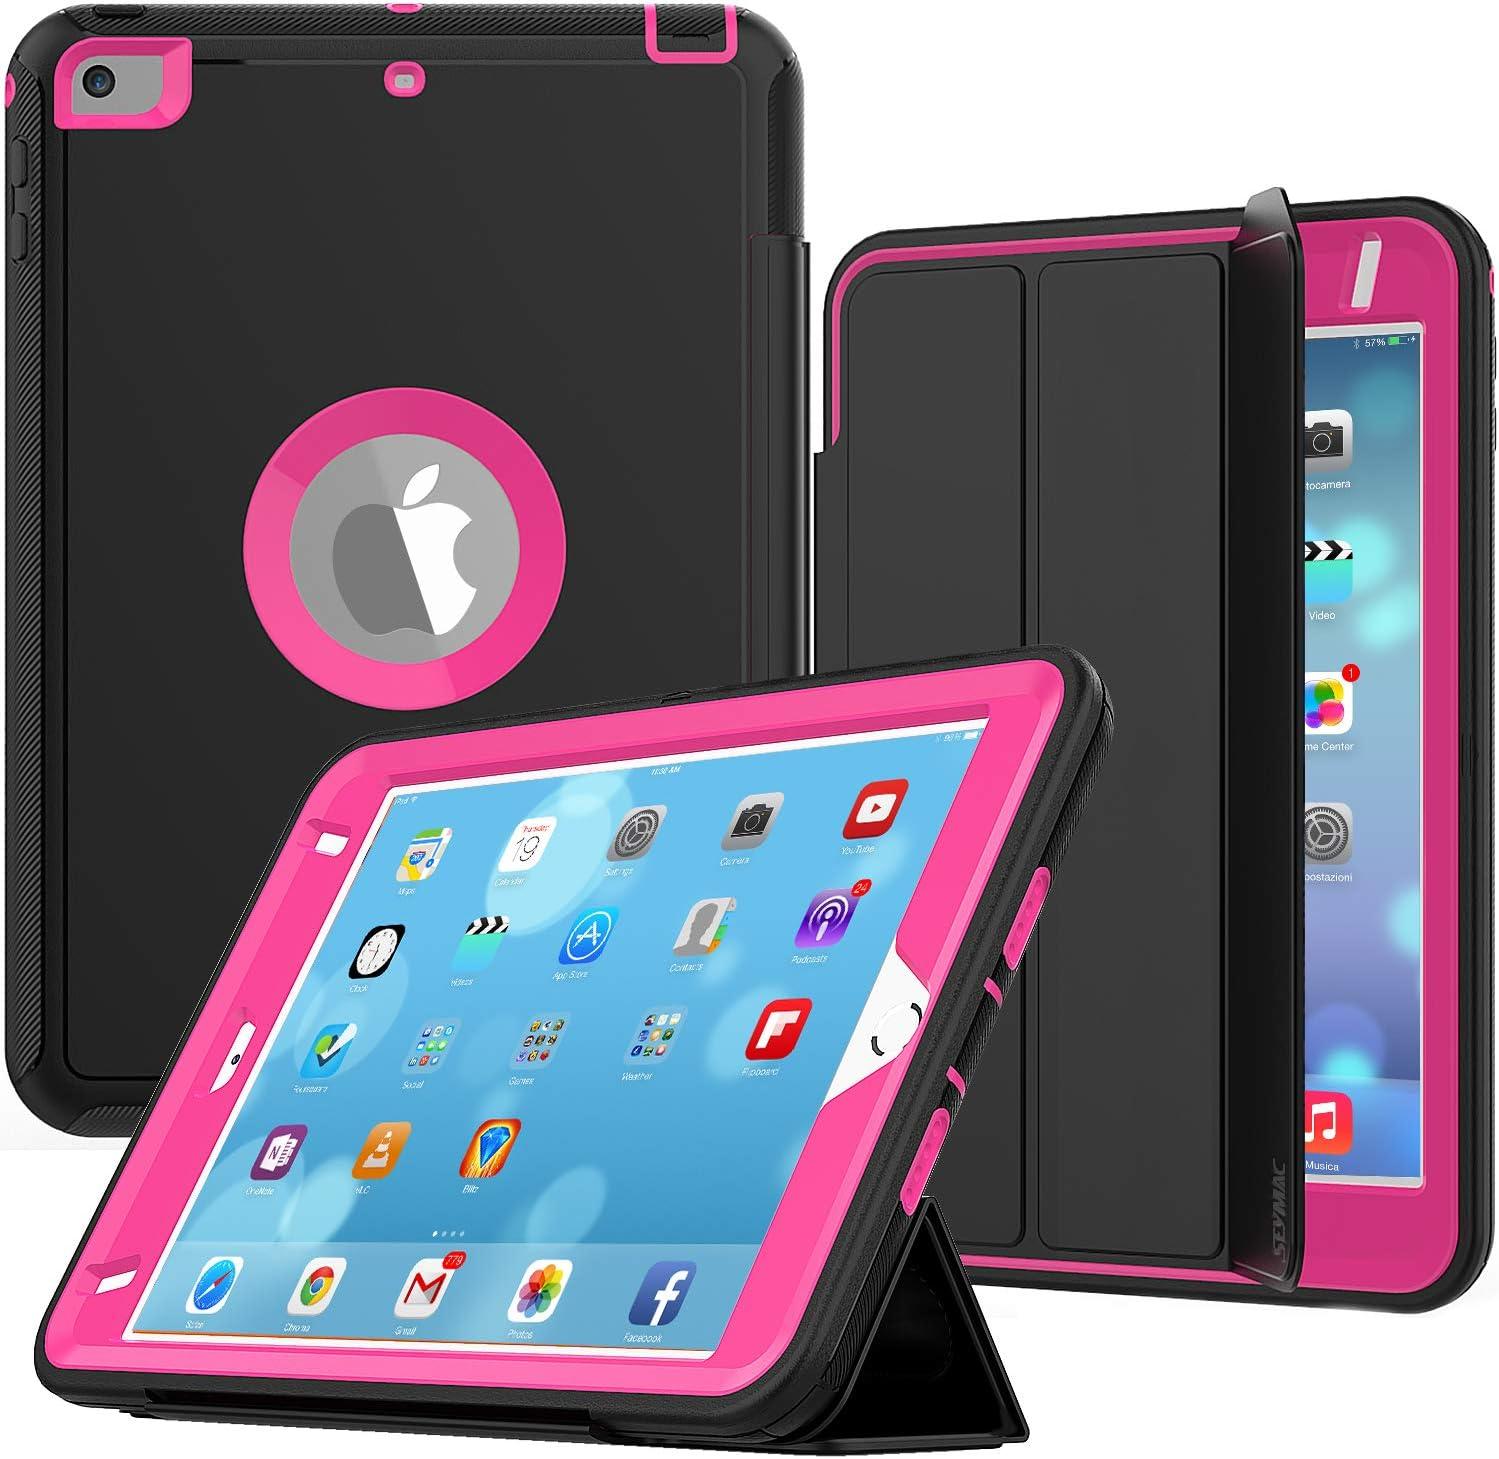 iPad Mini 4/5 Case, iPad Mini 4th/5th Generation Cases, SEYMAC Shockproof Heavy Duty Drop Protection Rugged Protective Case with Smart Auto Wake/Sleep Cover for 7.9 inch iPad Mini 4/5 Gen(Black/Rose)